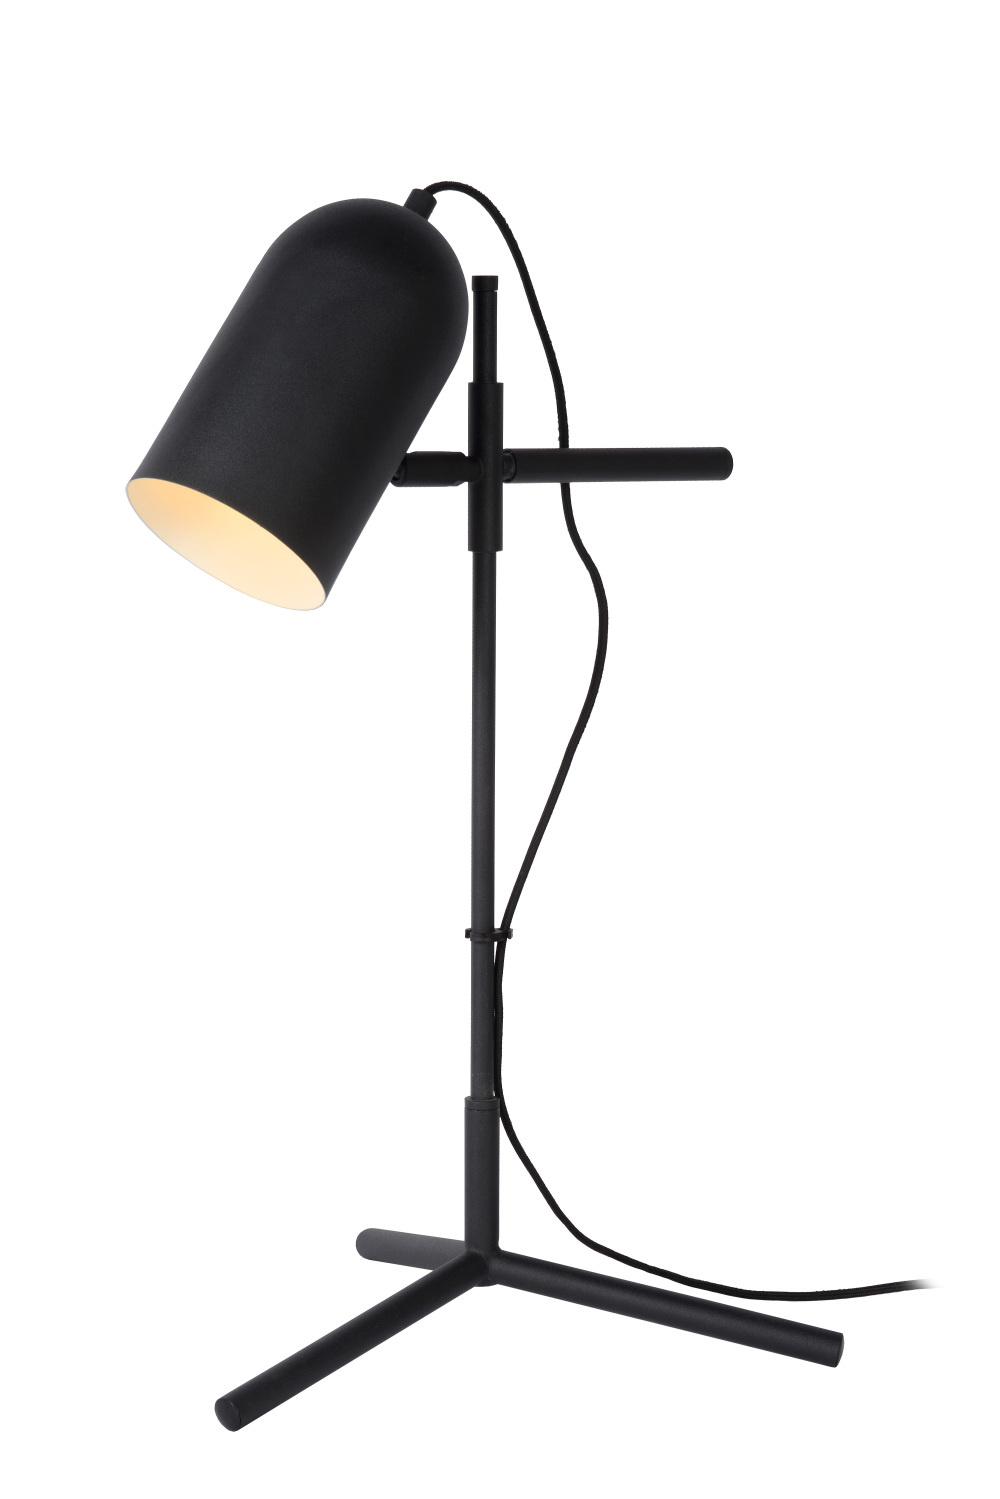 Lucide EDEK Tafellamp-Zwart-1xE27-40W-Staal